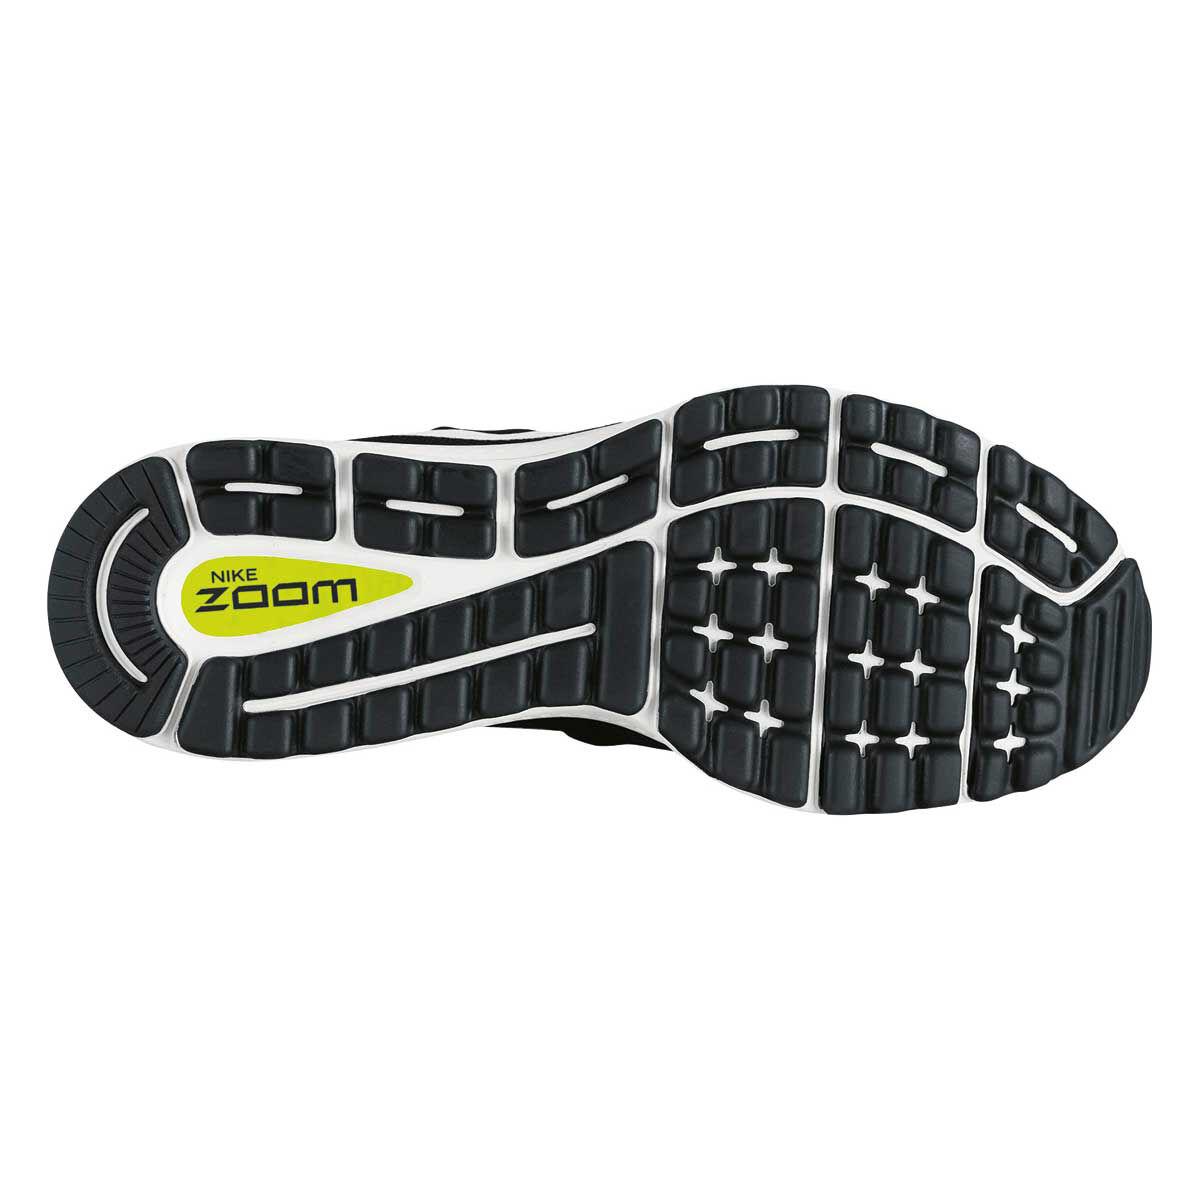 Nike Air Zoom Vomero 12 Mens Running Shoes Black White US 8